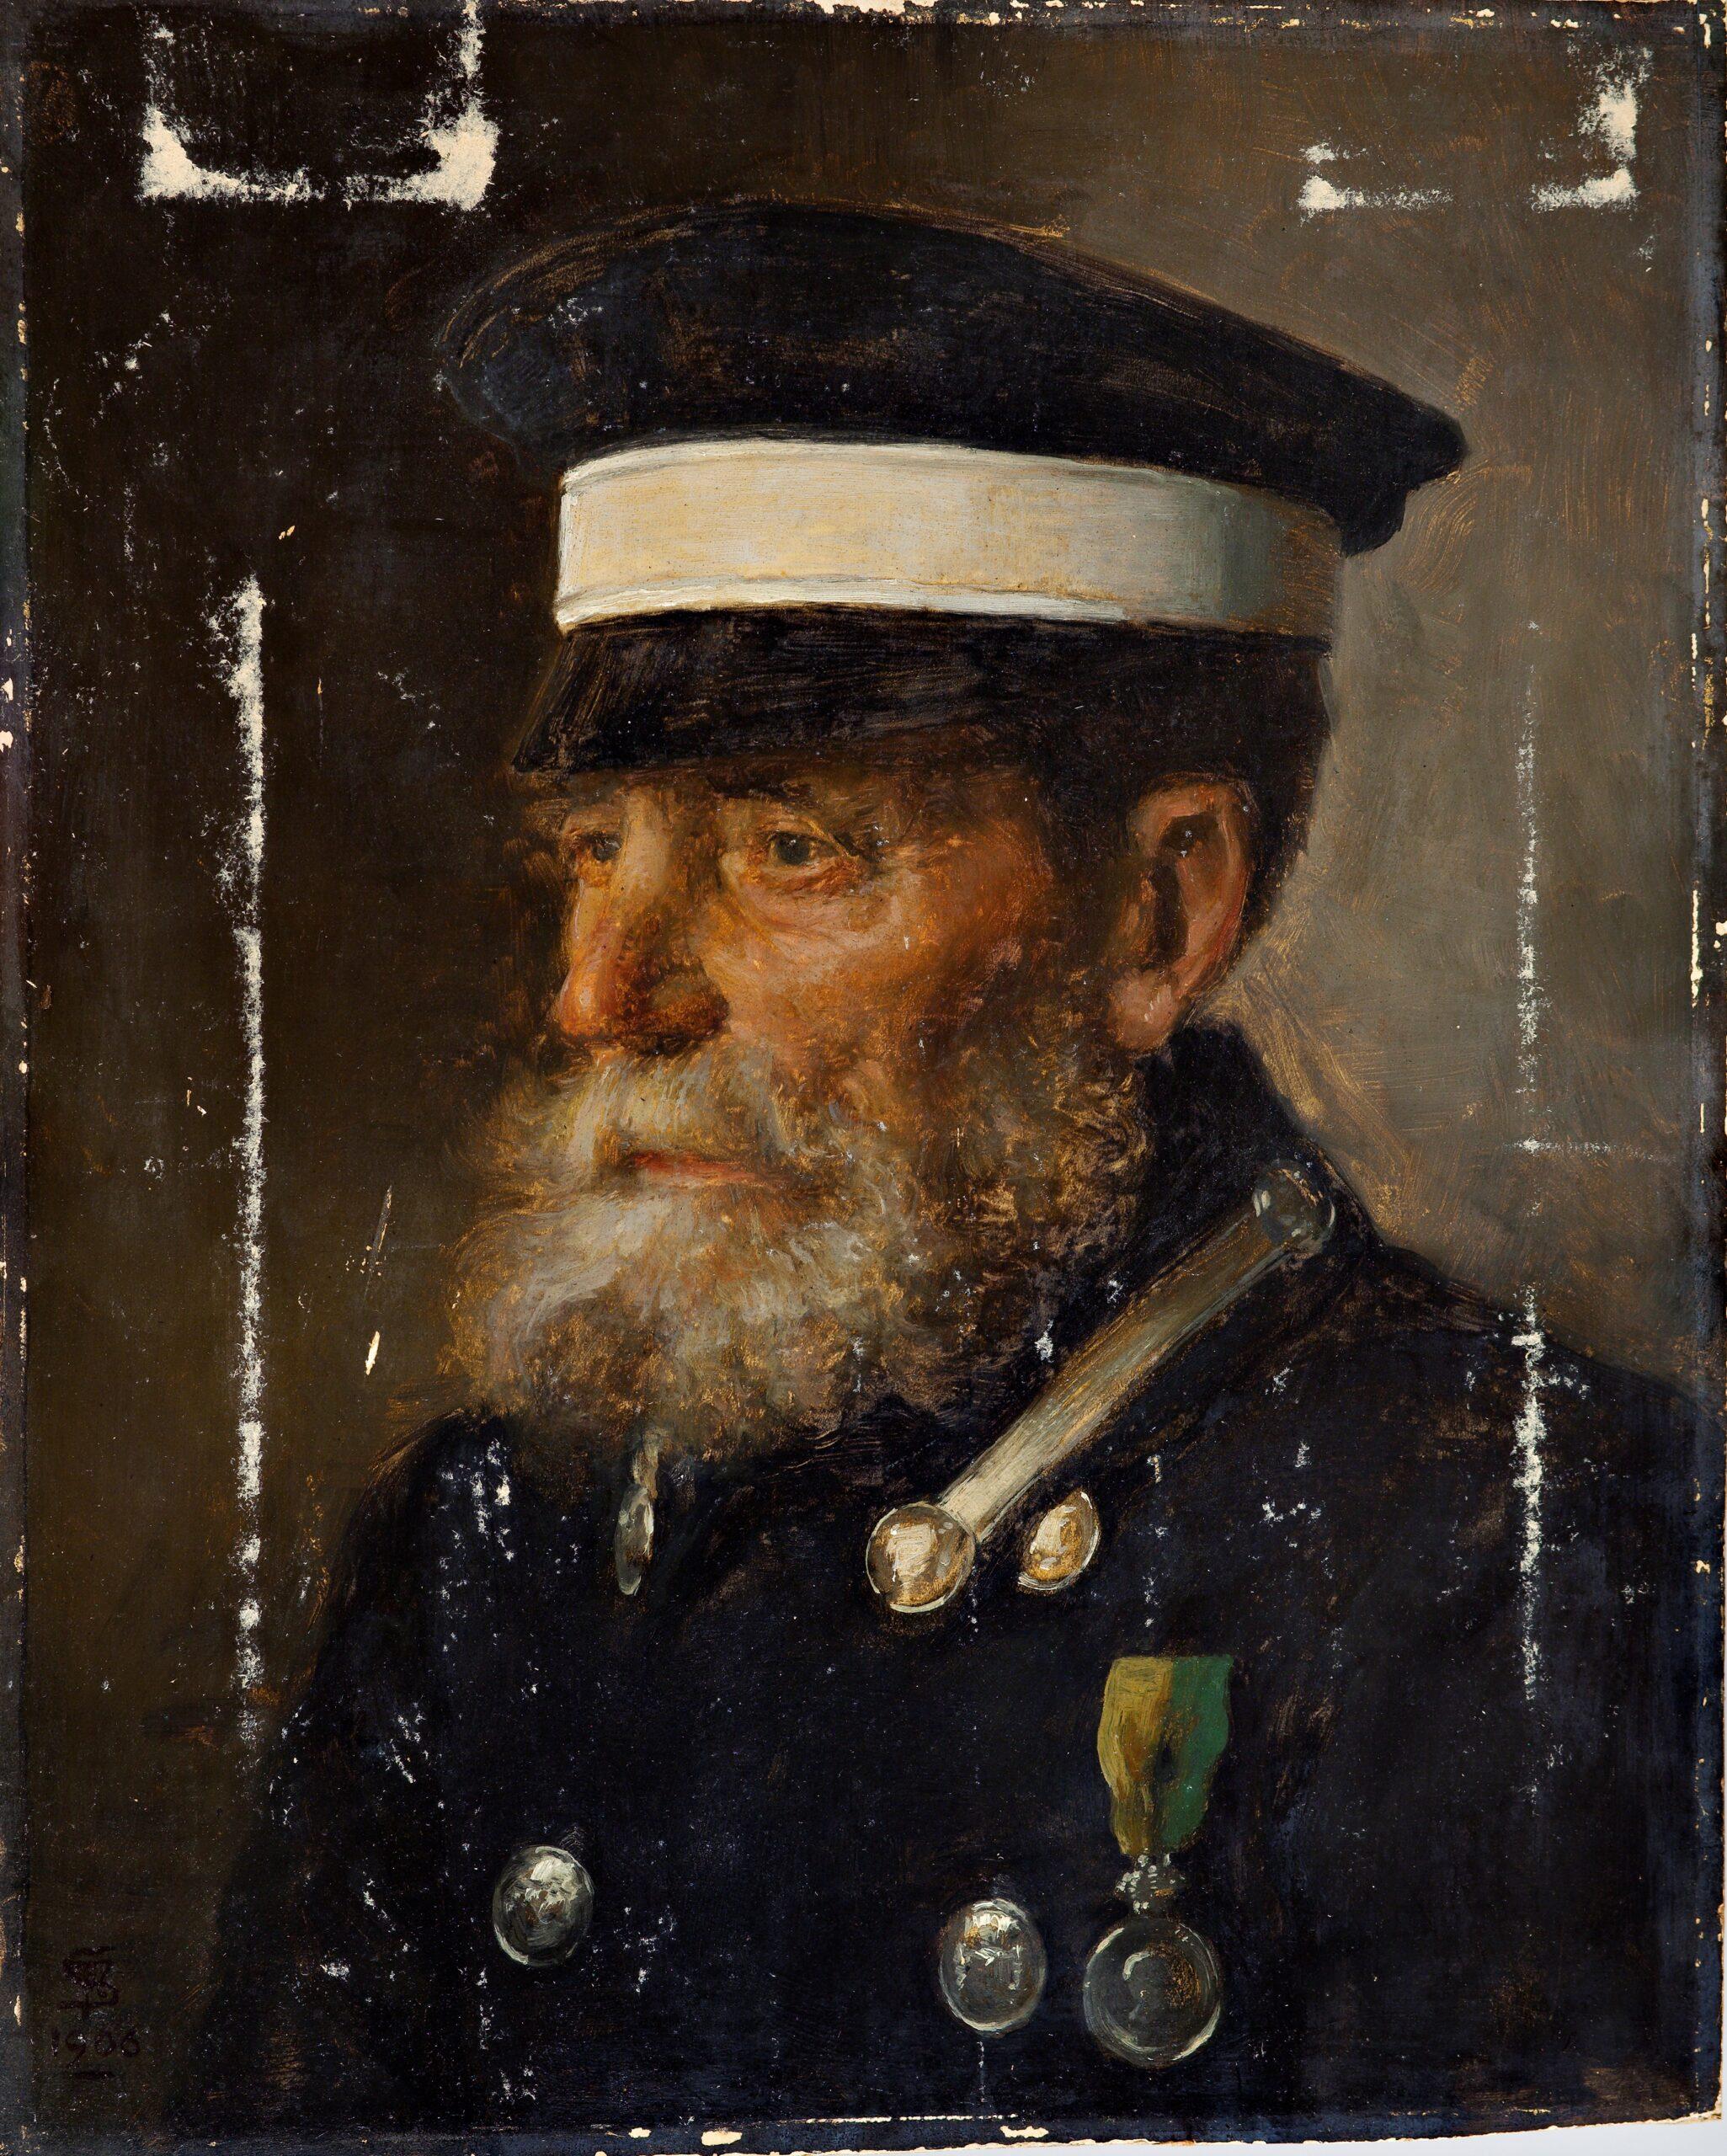 Maleri af Frans Schwartz, Kusken Jöns, 1906. Nivaagaards Malerisamling